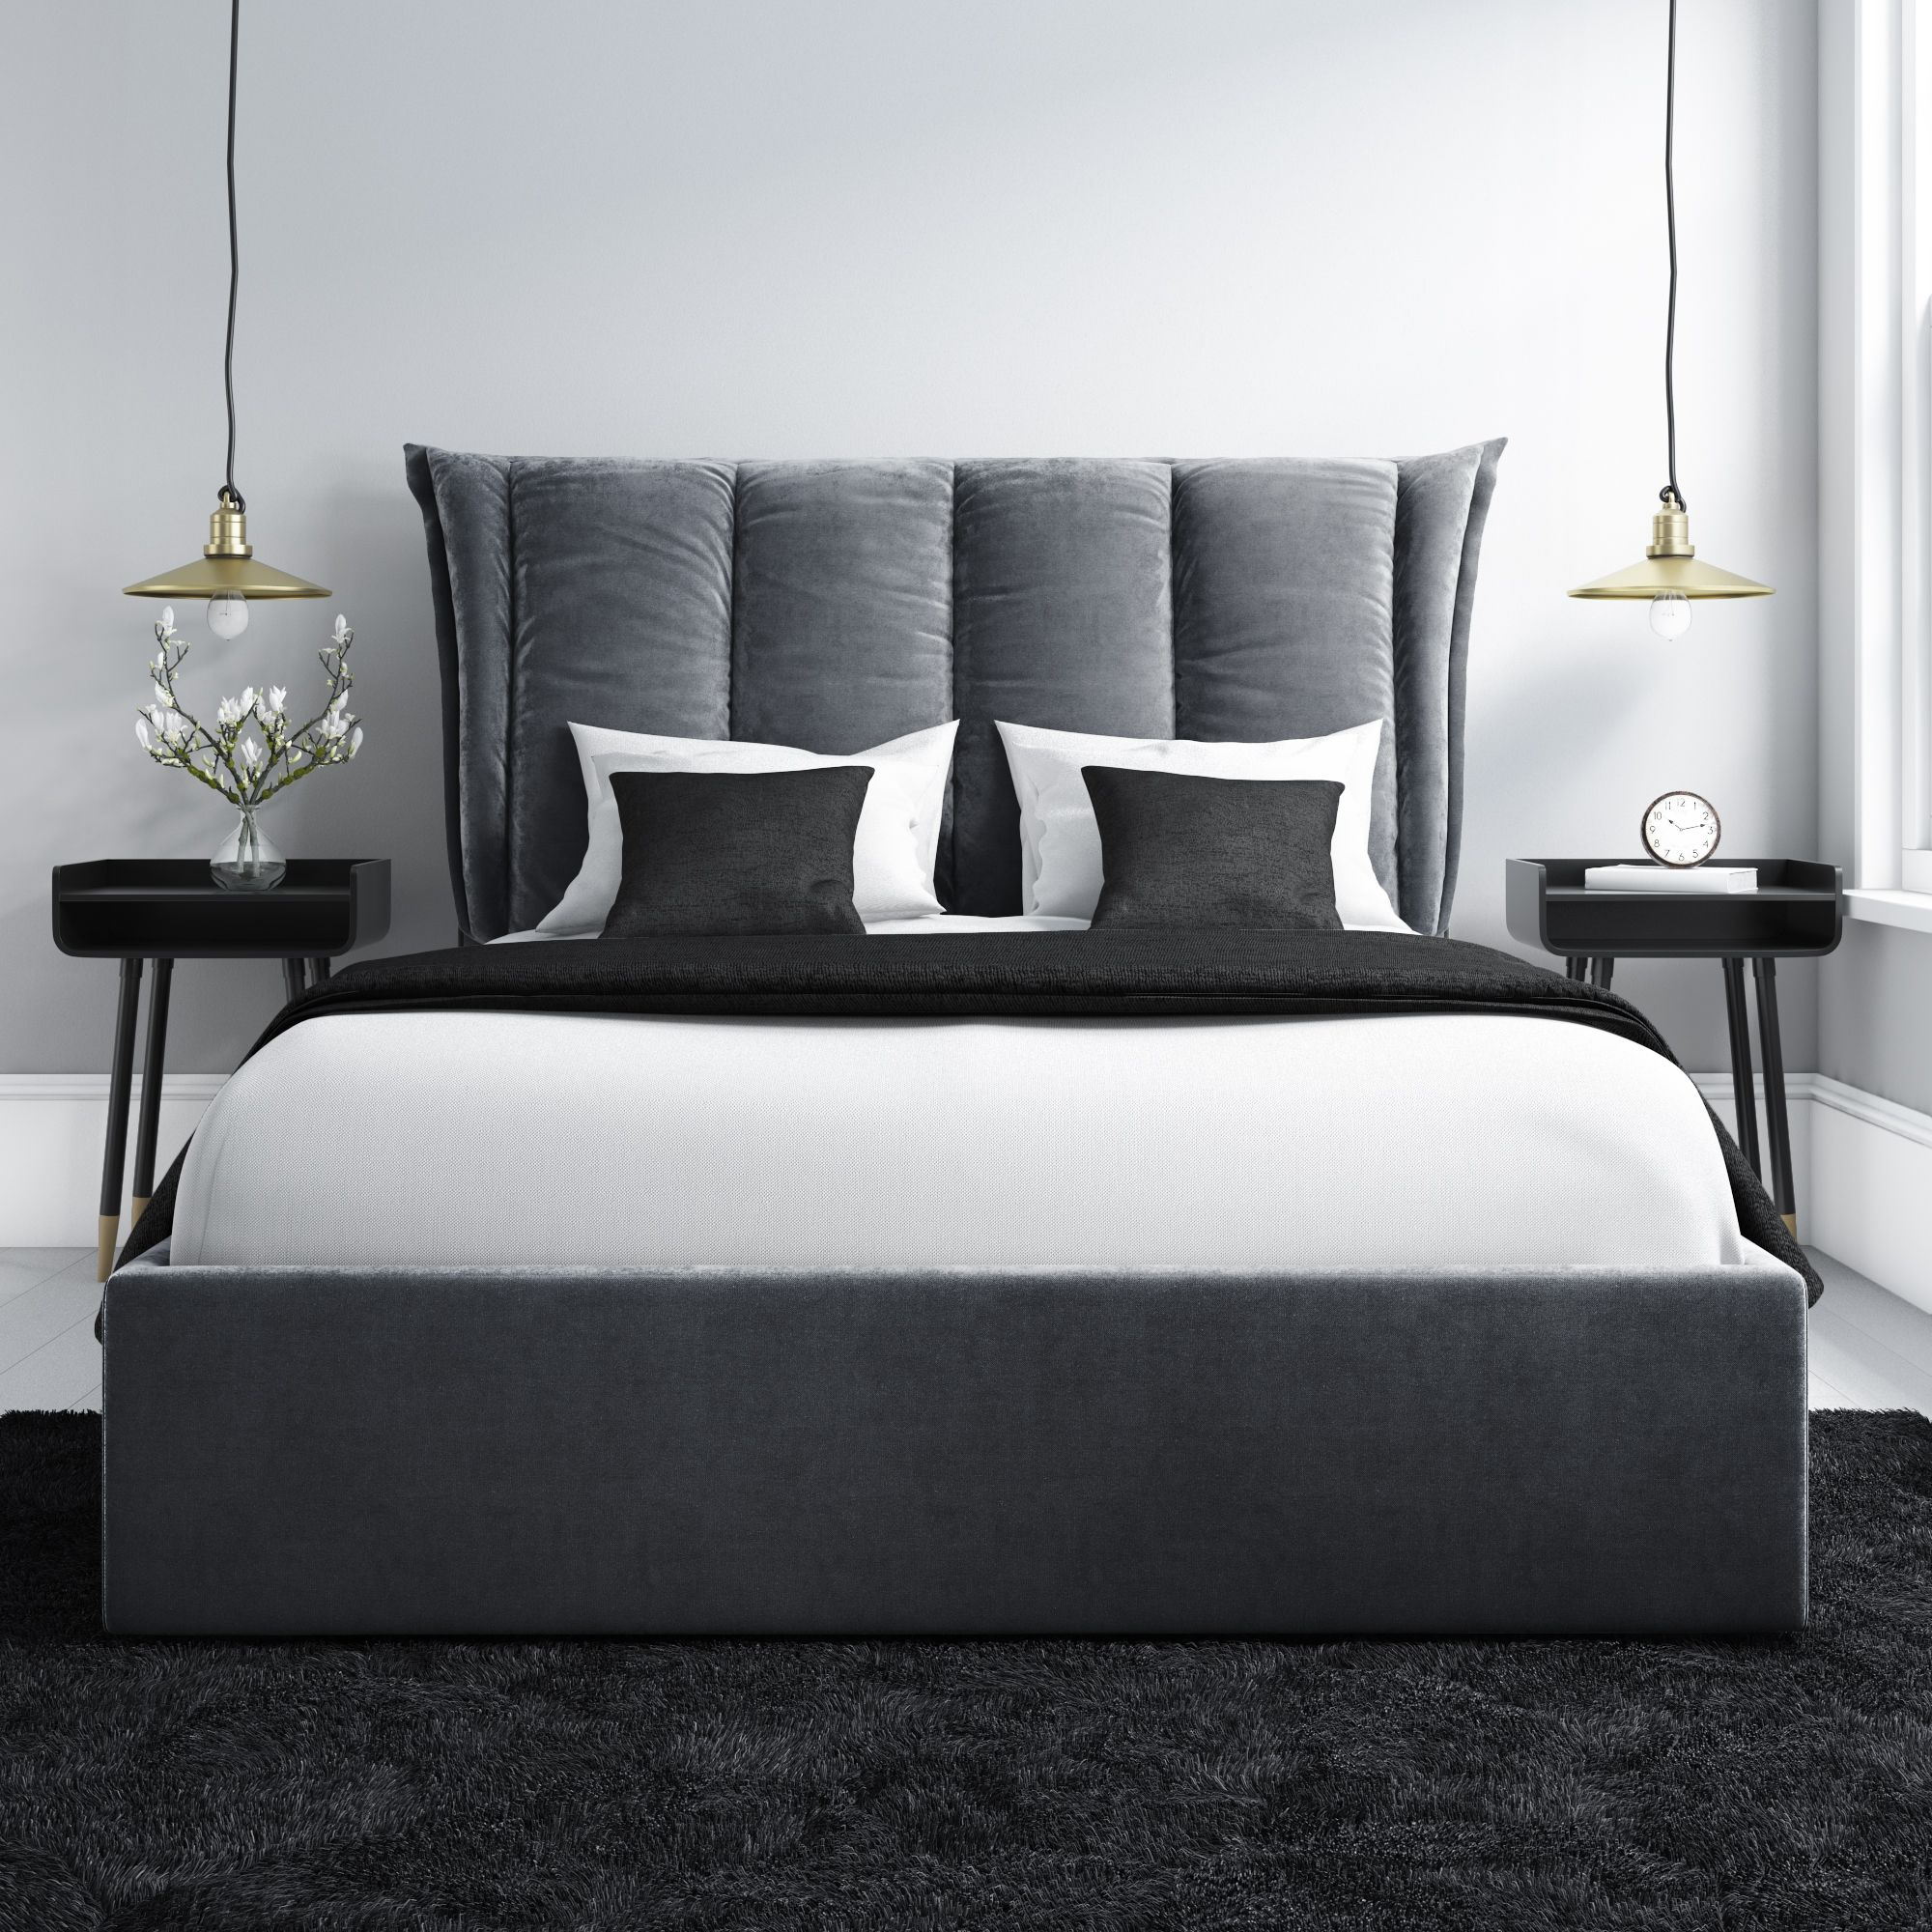 ottoman bed cushion headboard